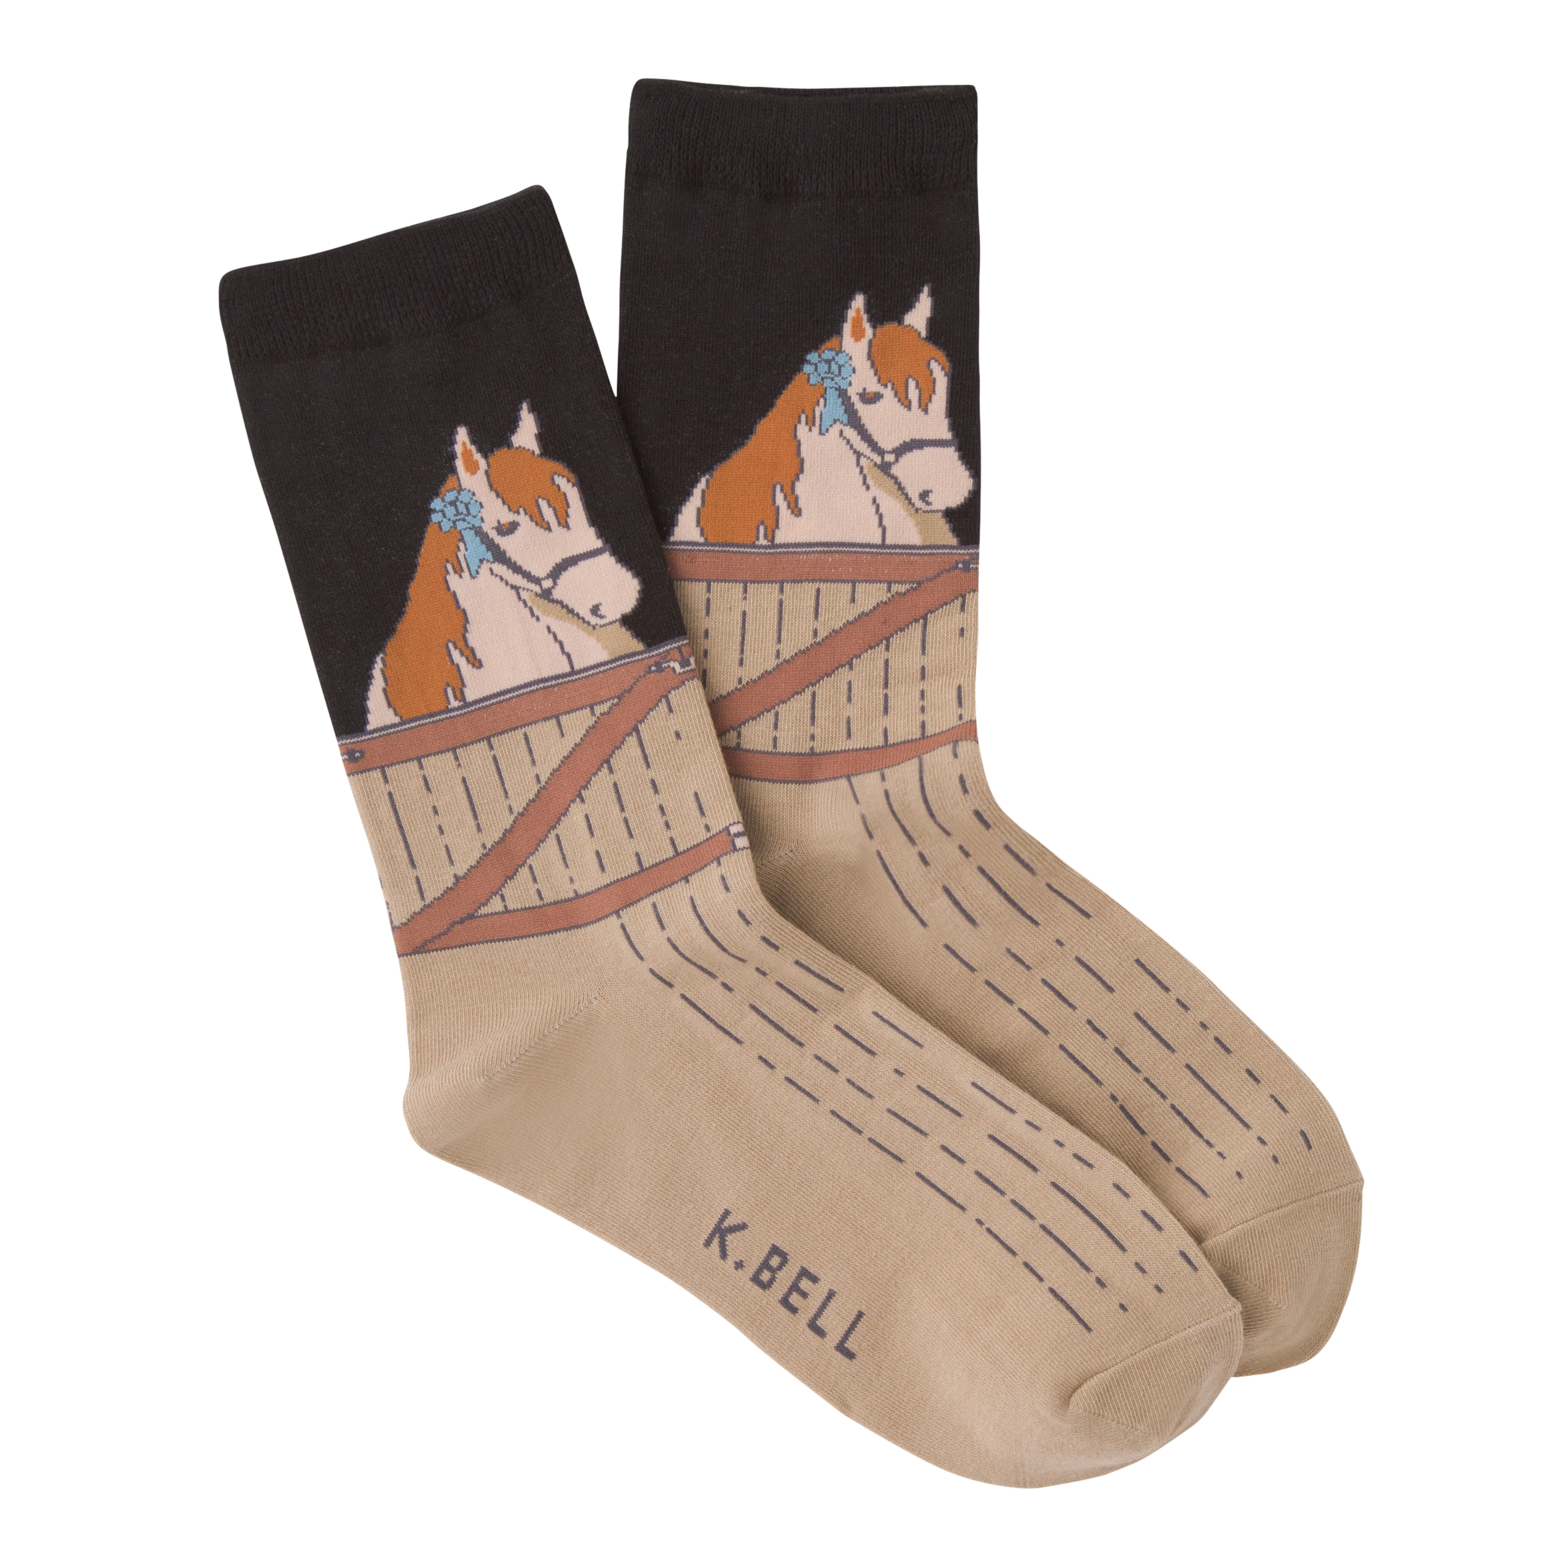 Socks with horse barn illustration